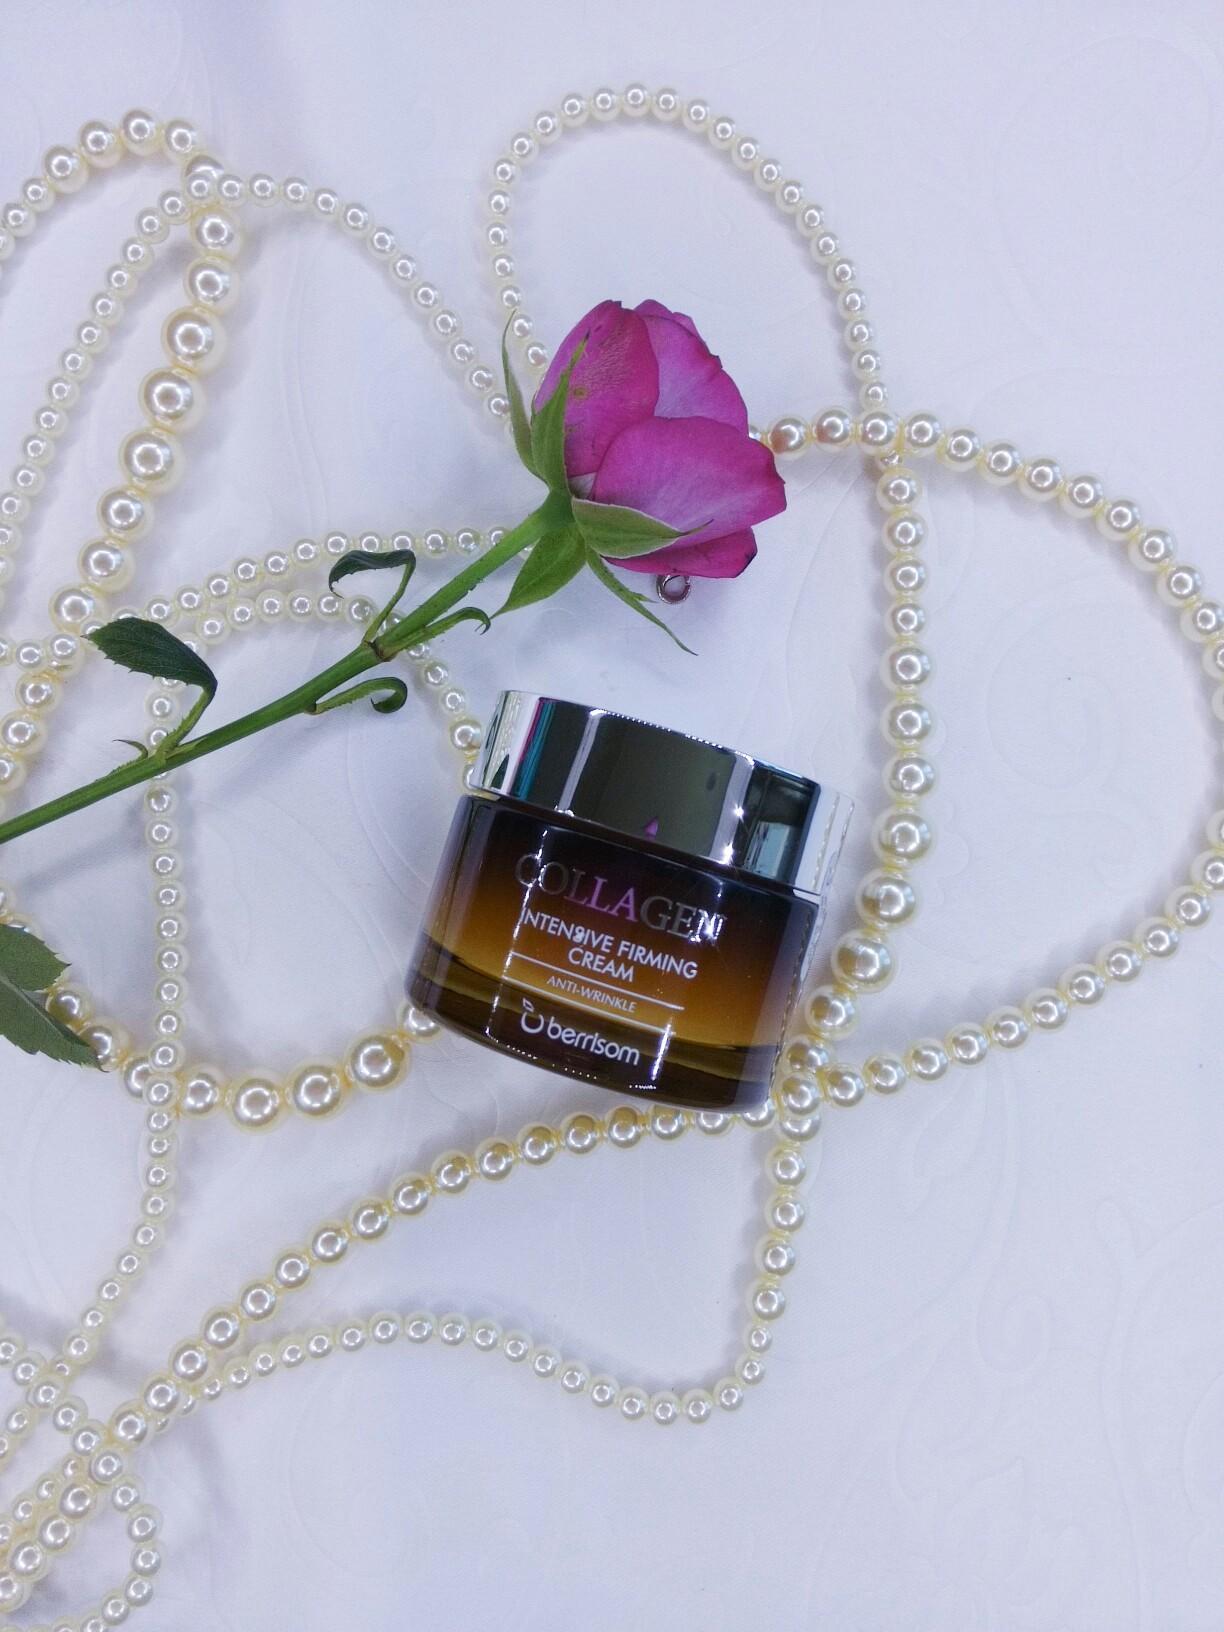 Cream Berrisom Collagen Intensive Firming 50gr